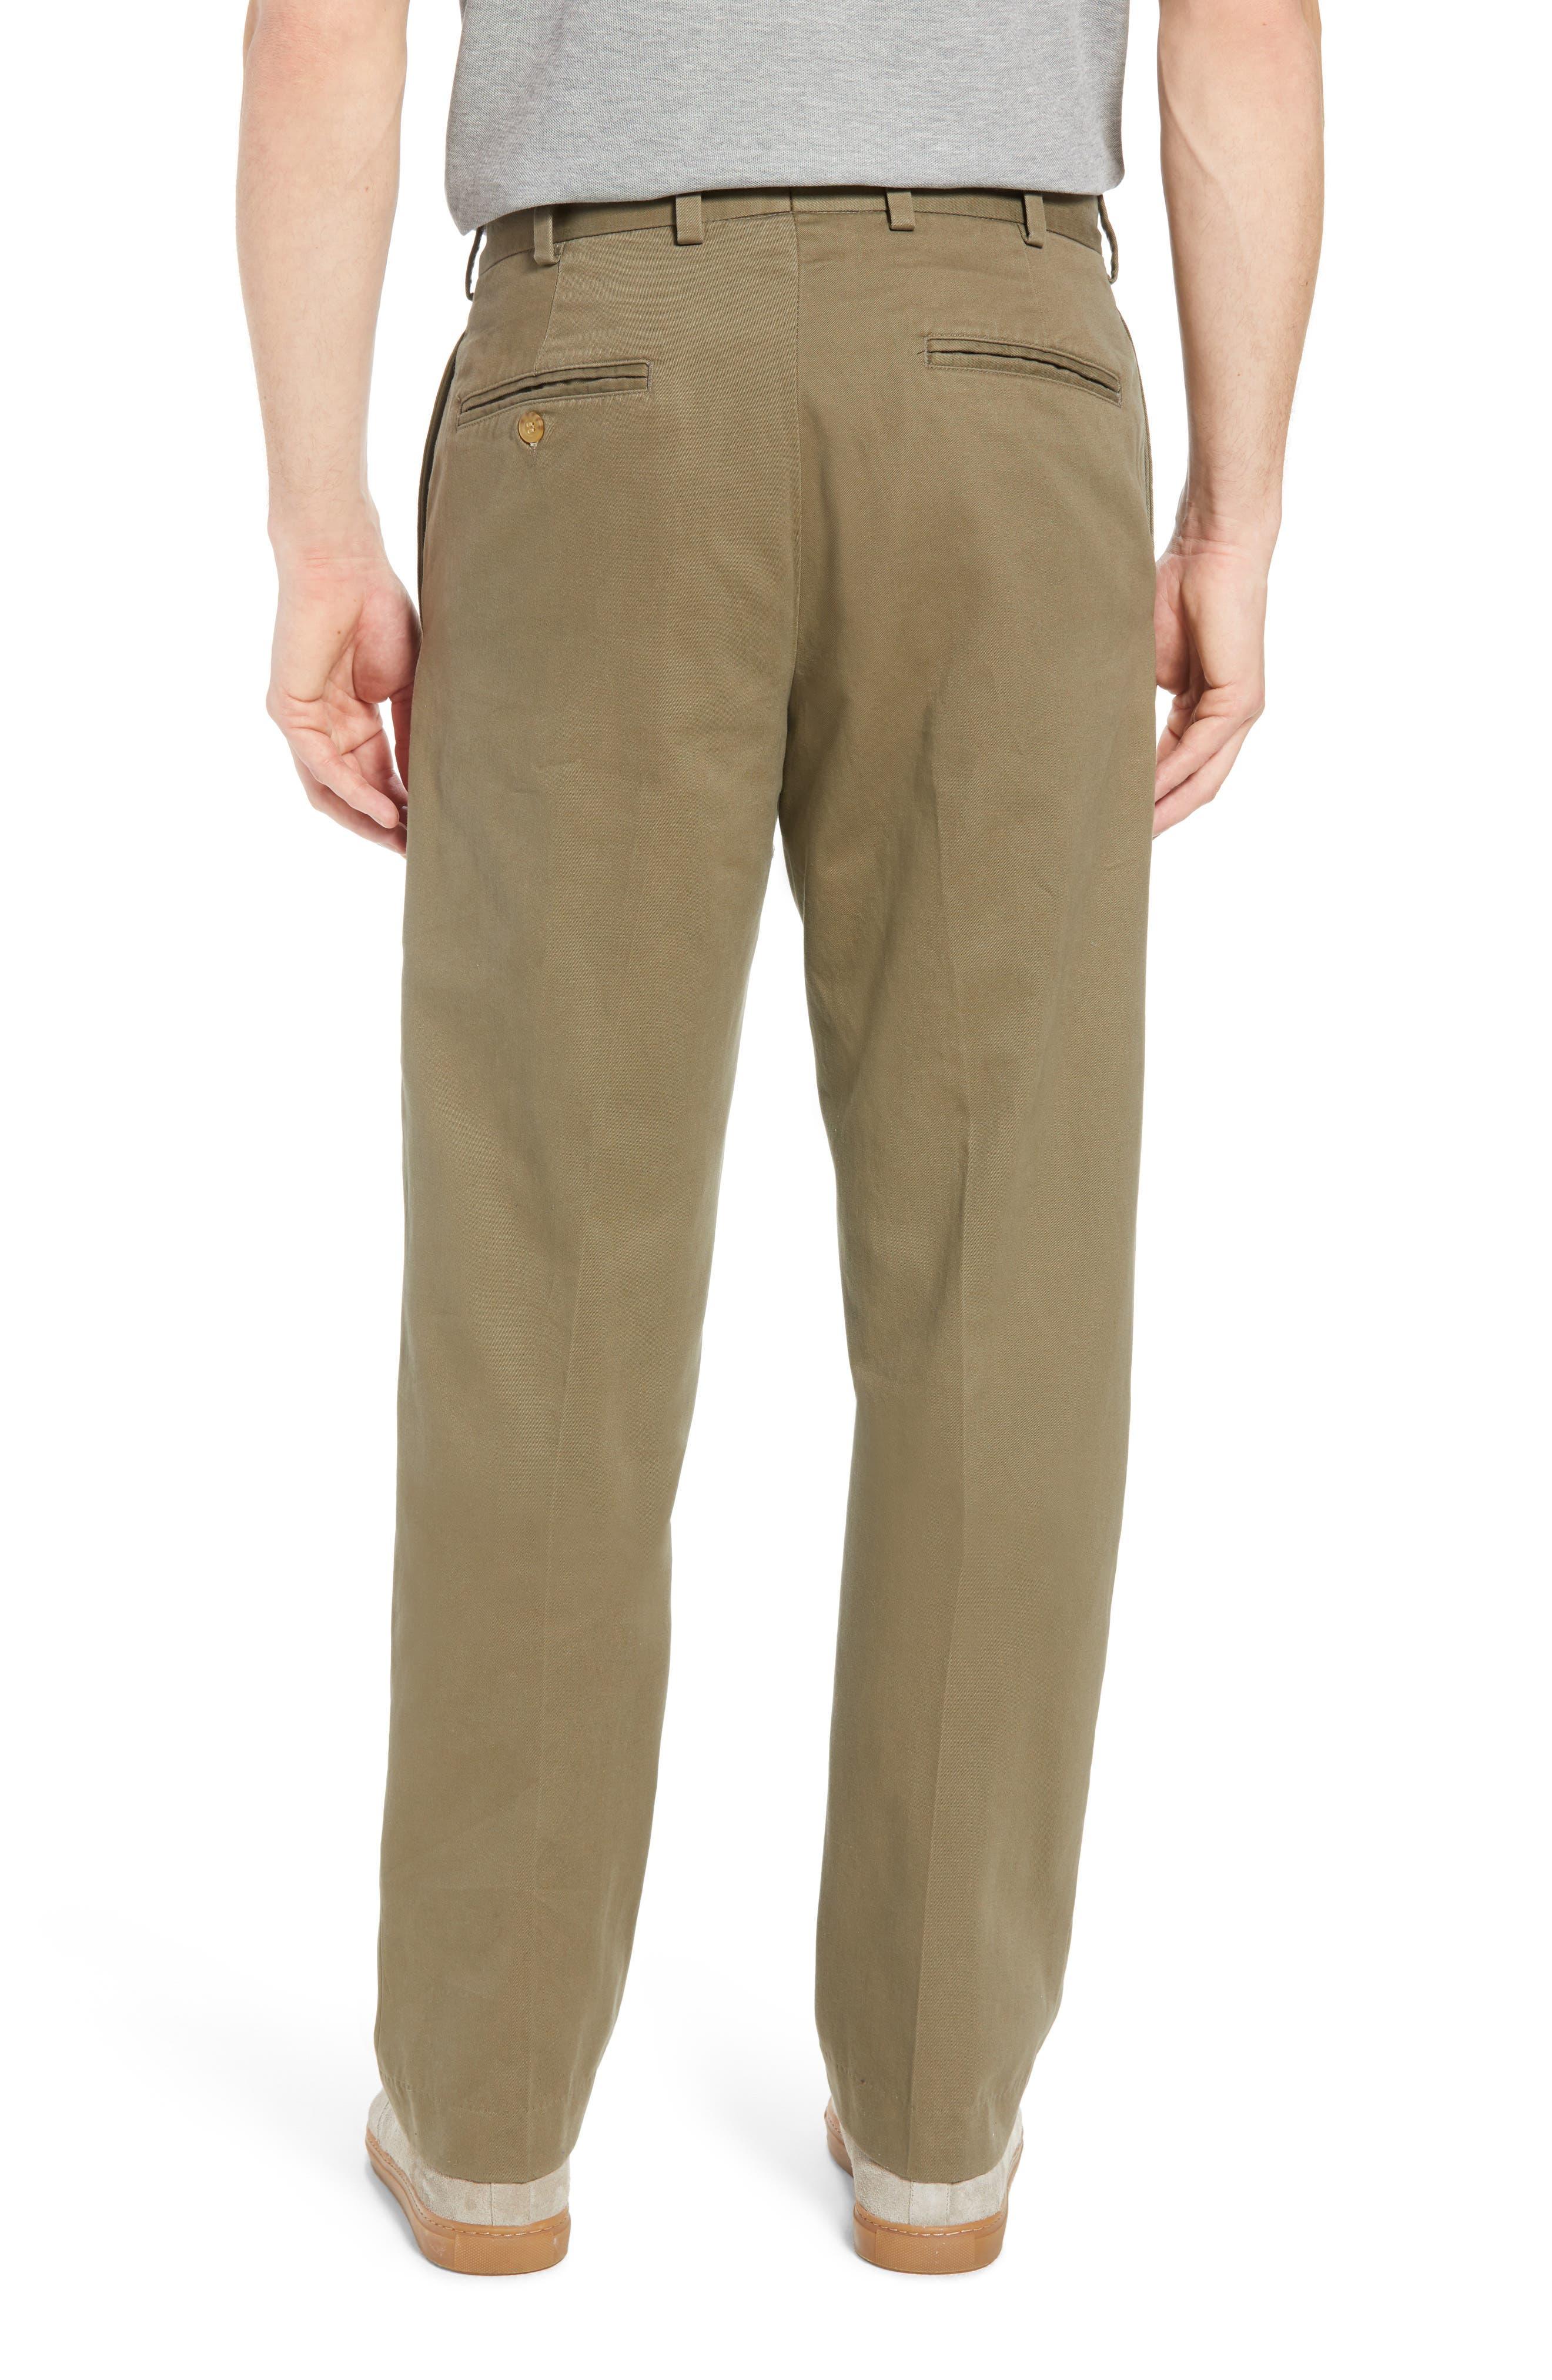 M2 Classic Fit Flat Front Vintage Twill Pants,                             Alternate thumbnail 2, color,                             330